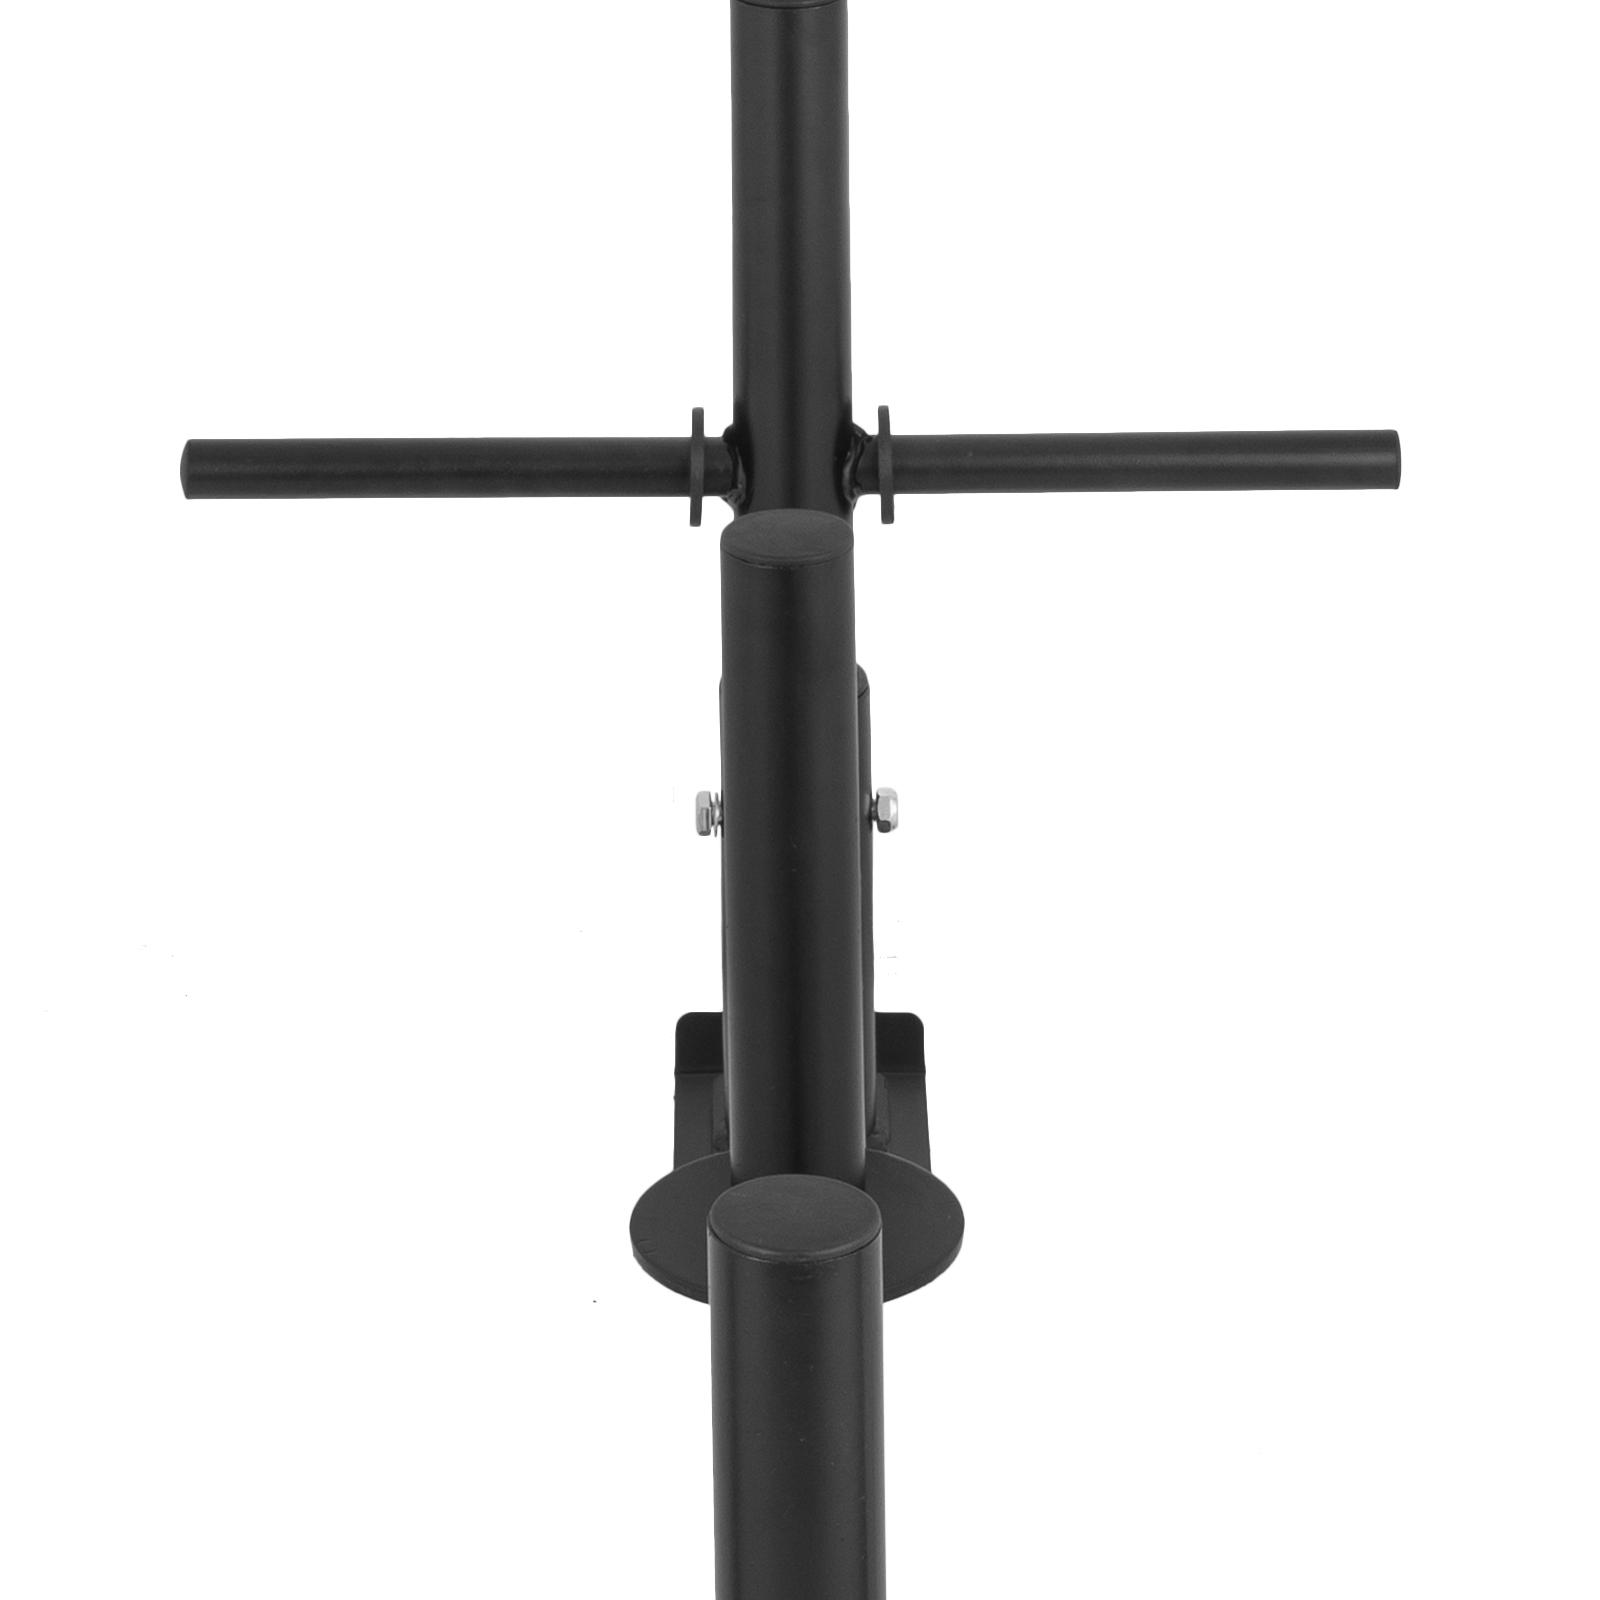 Fitness-HD-Weight-Sled-Low-Push-Pull-High-Training-Training-Fitness-Plates miniatura 7